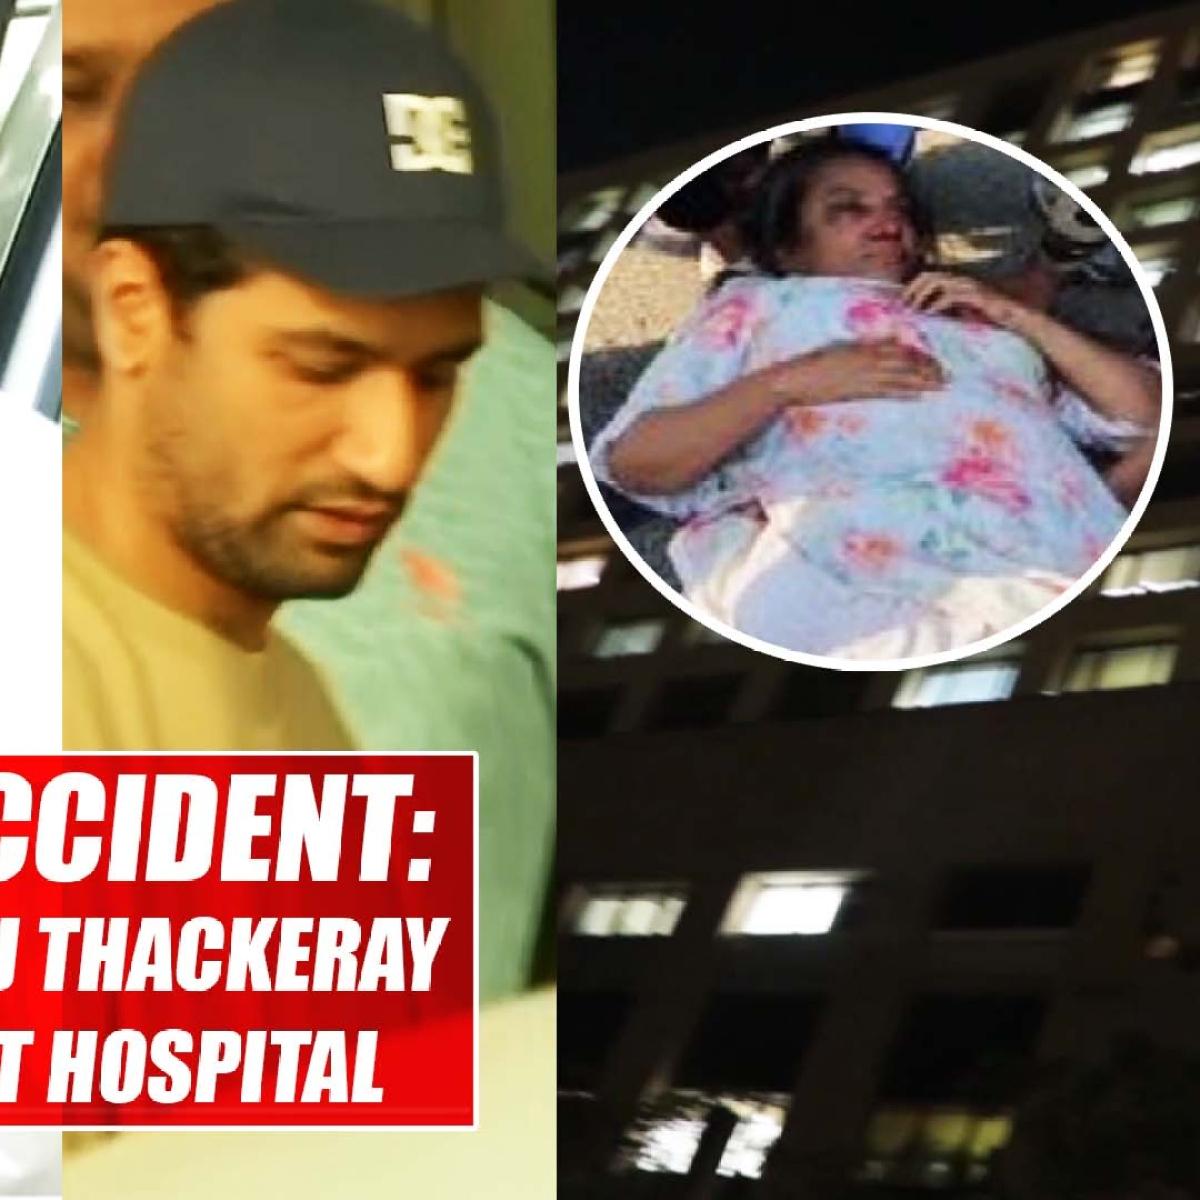 Shabana Azmi accident: Tabu, Vicky Kaushal, Raj Thackeray and other celebs visit hospital